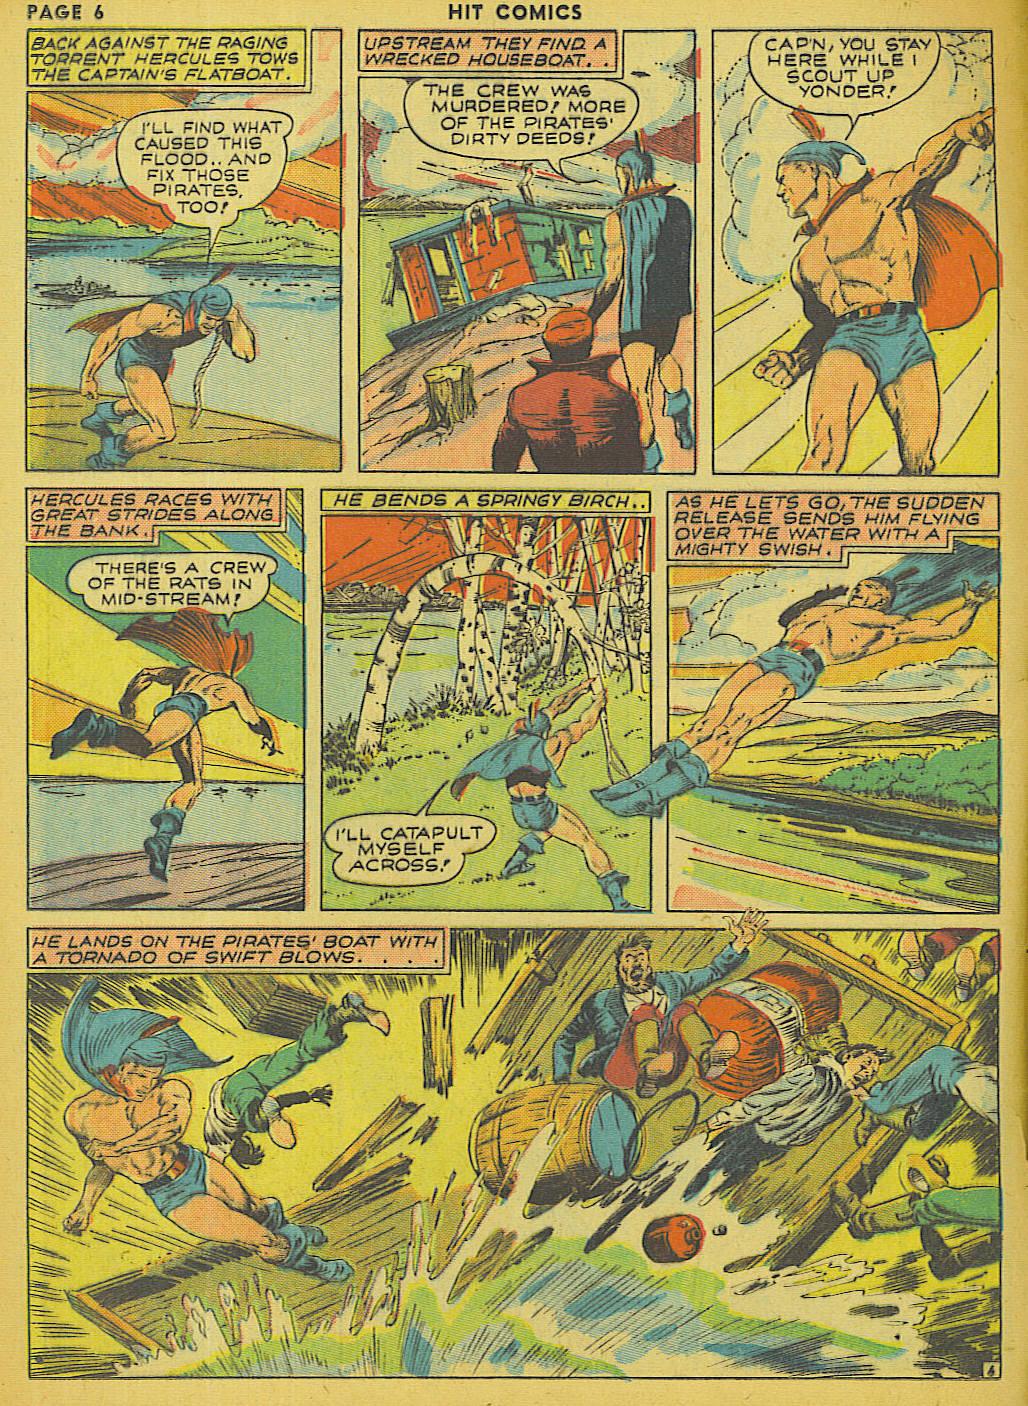 Read online Hit Comics comic -  Issue #13 - 8